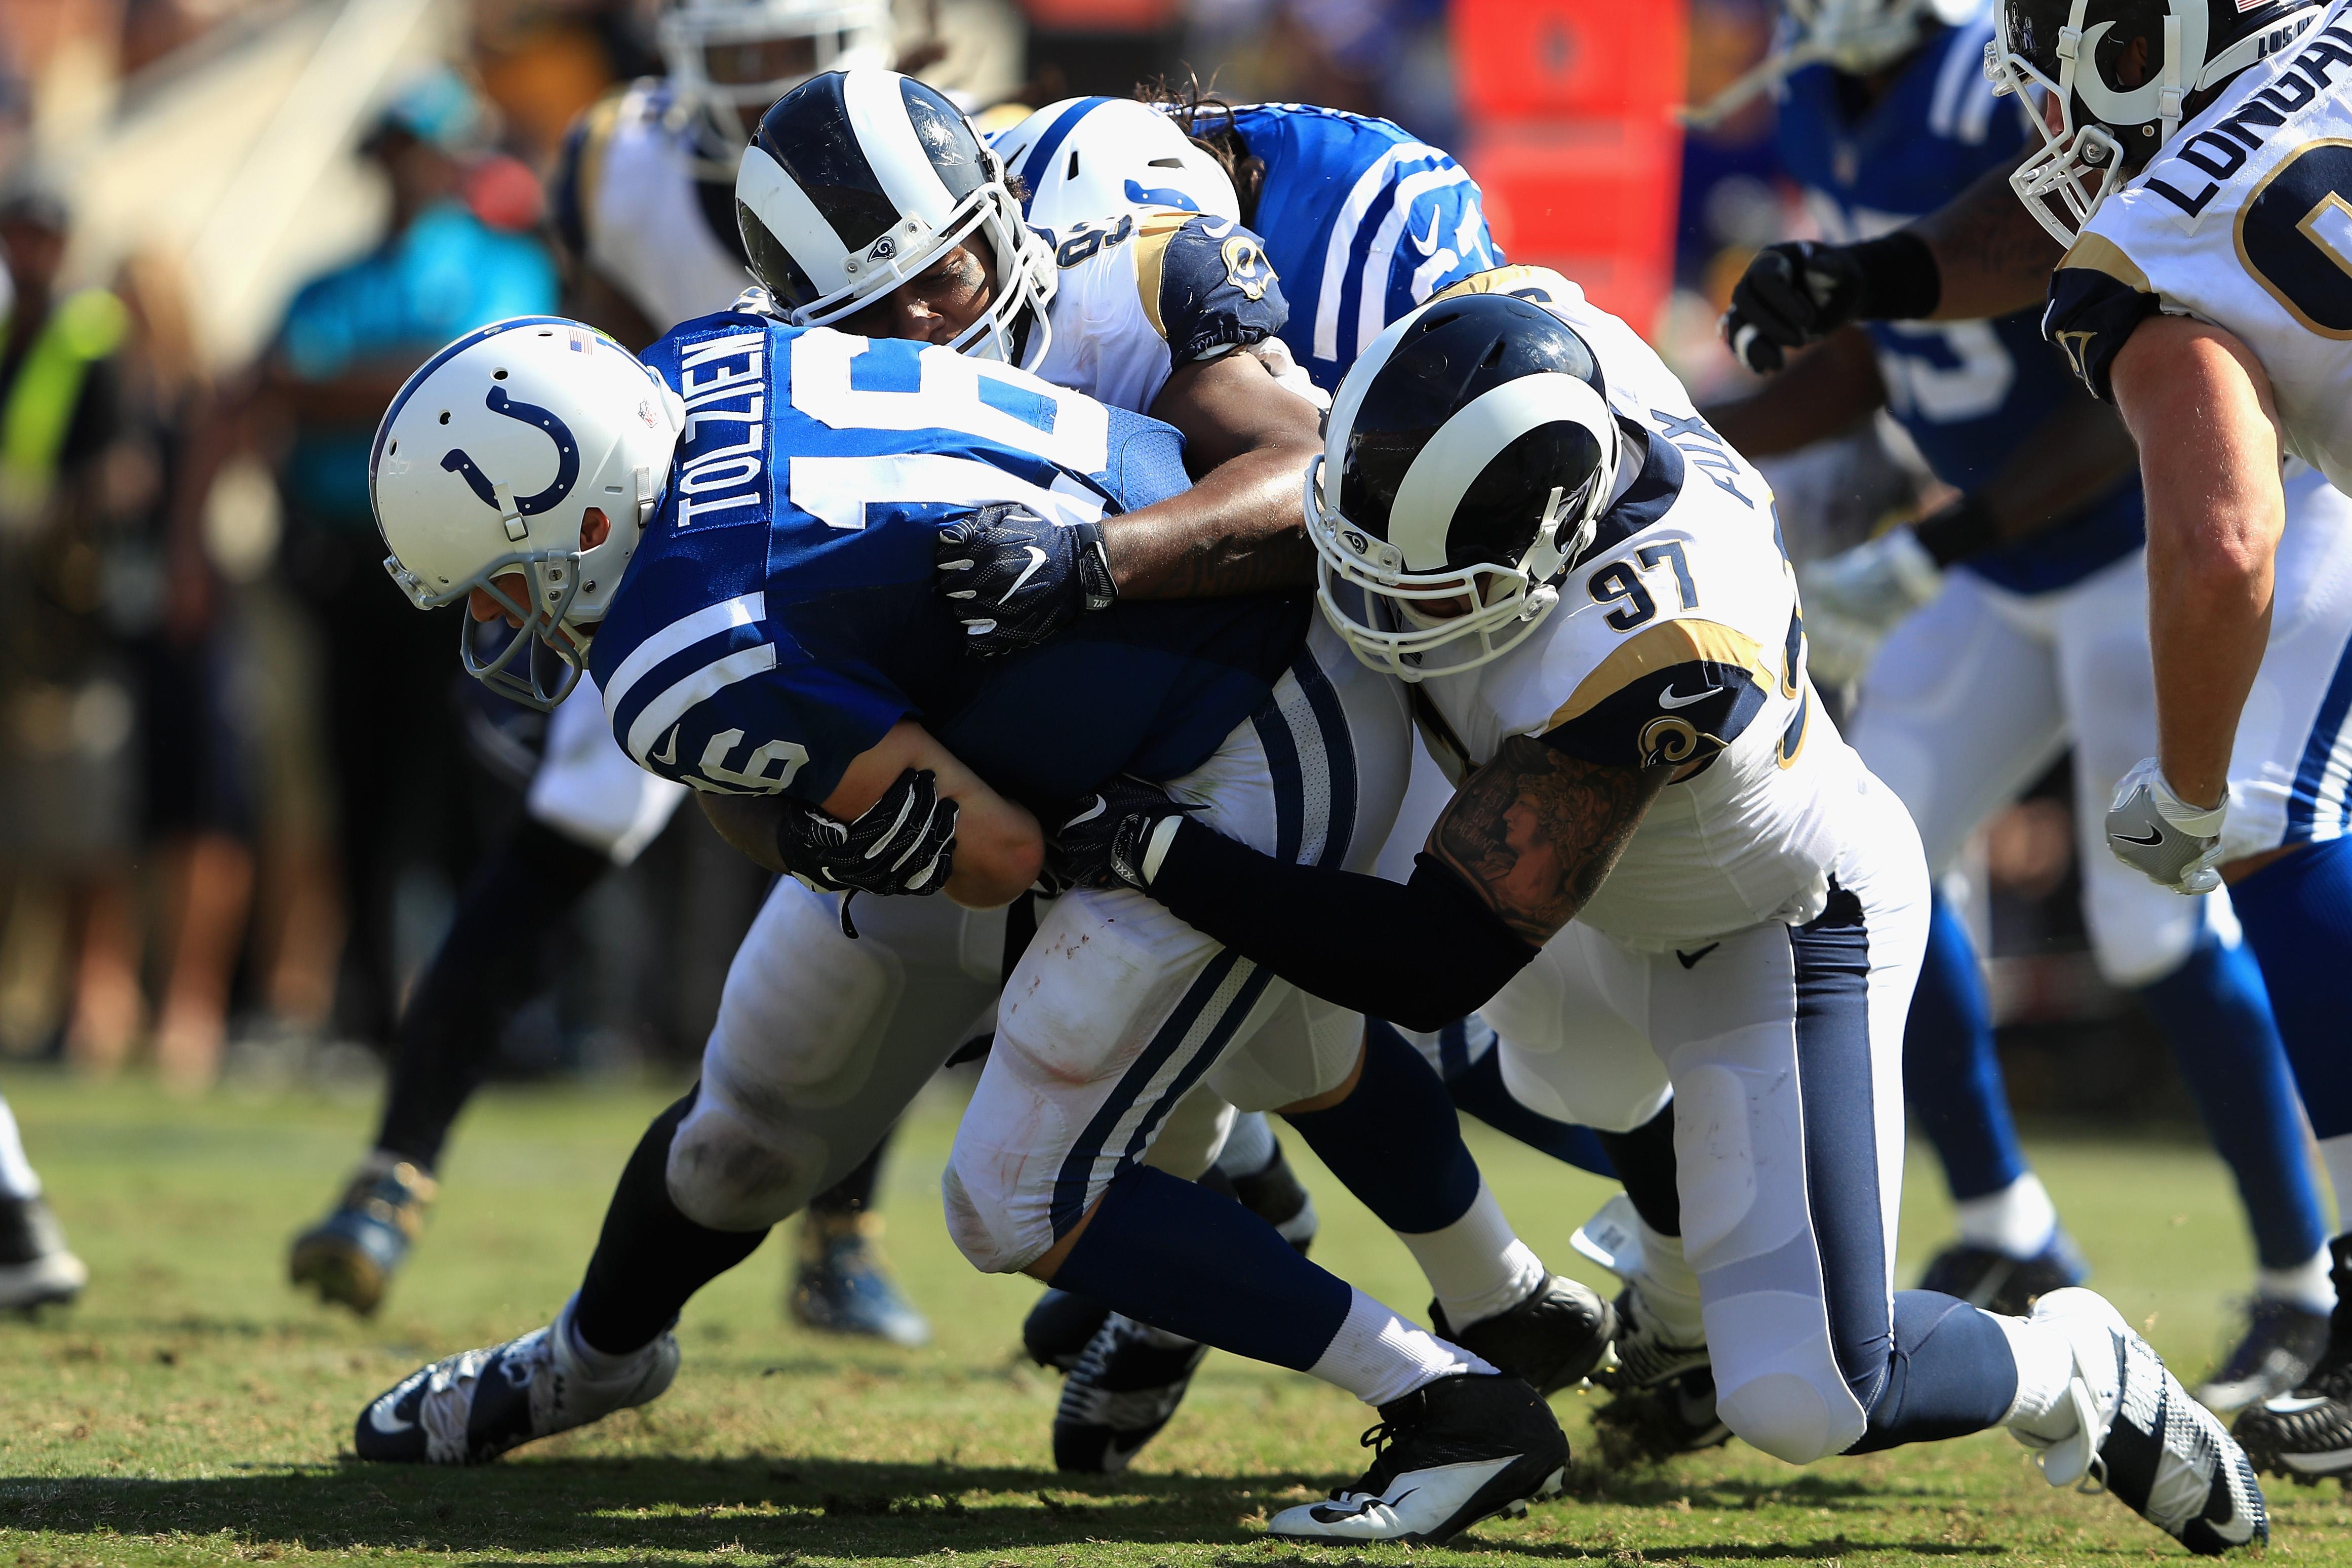 Indianapolis Colts DE Ethan Westbrooks